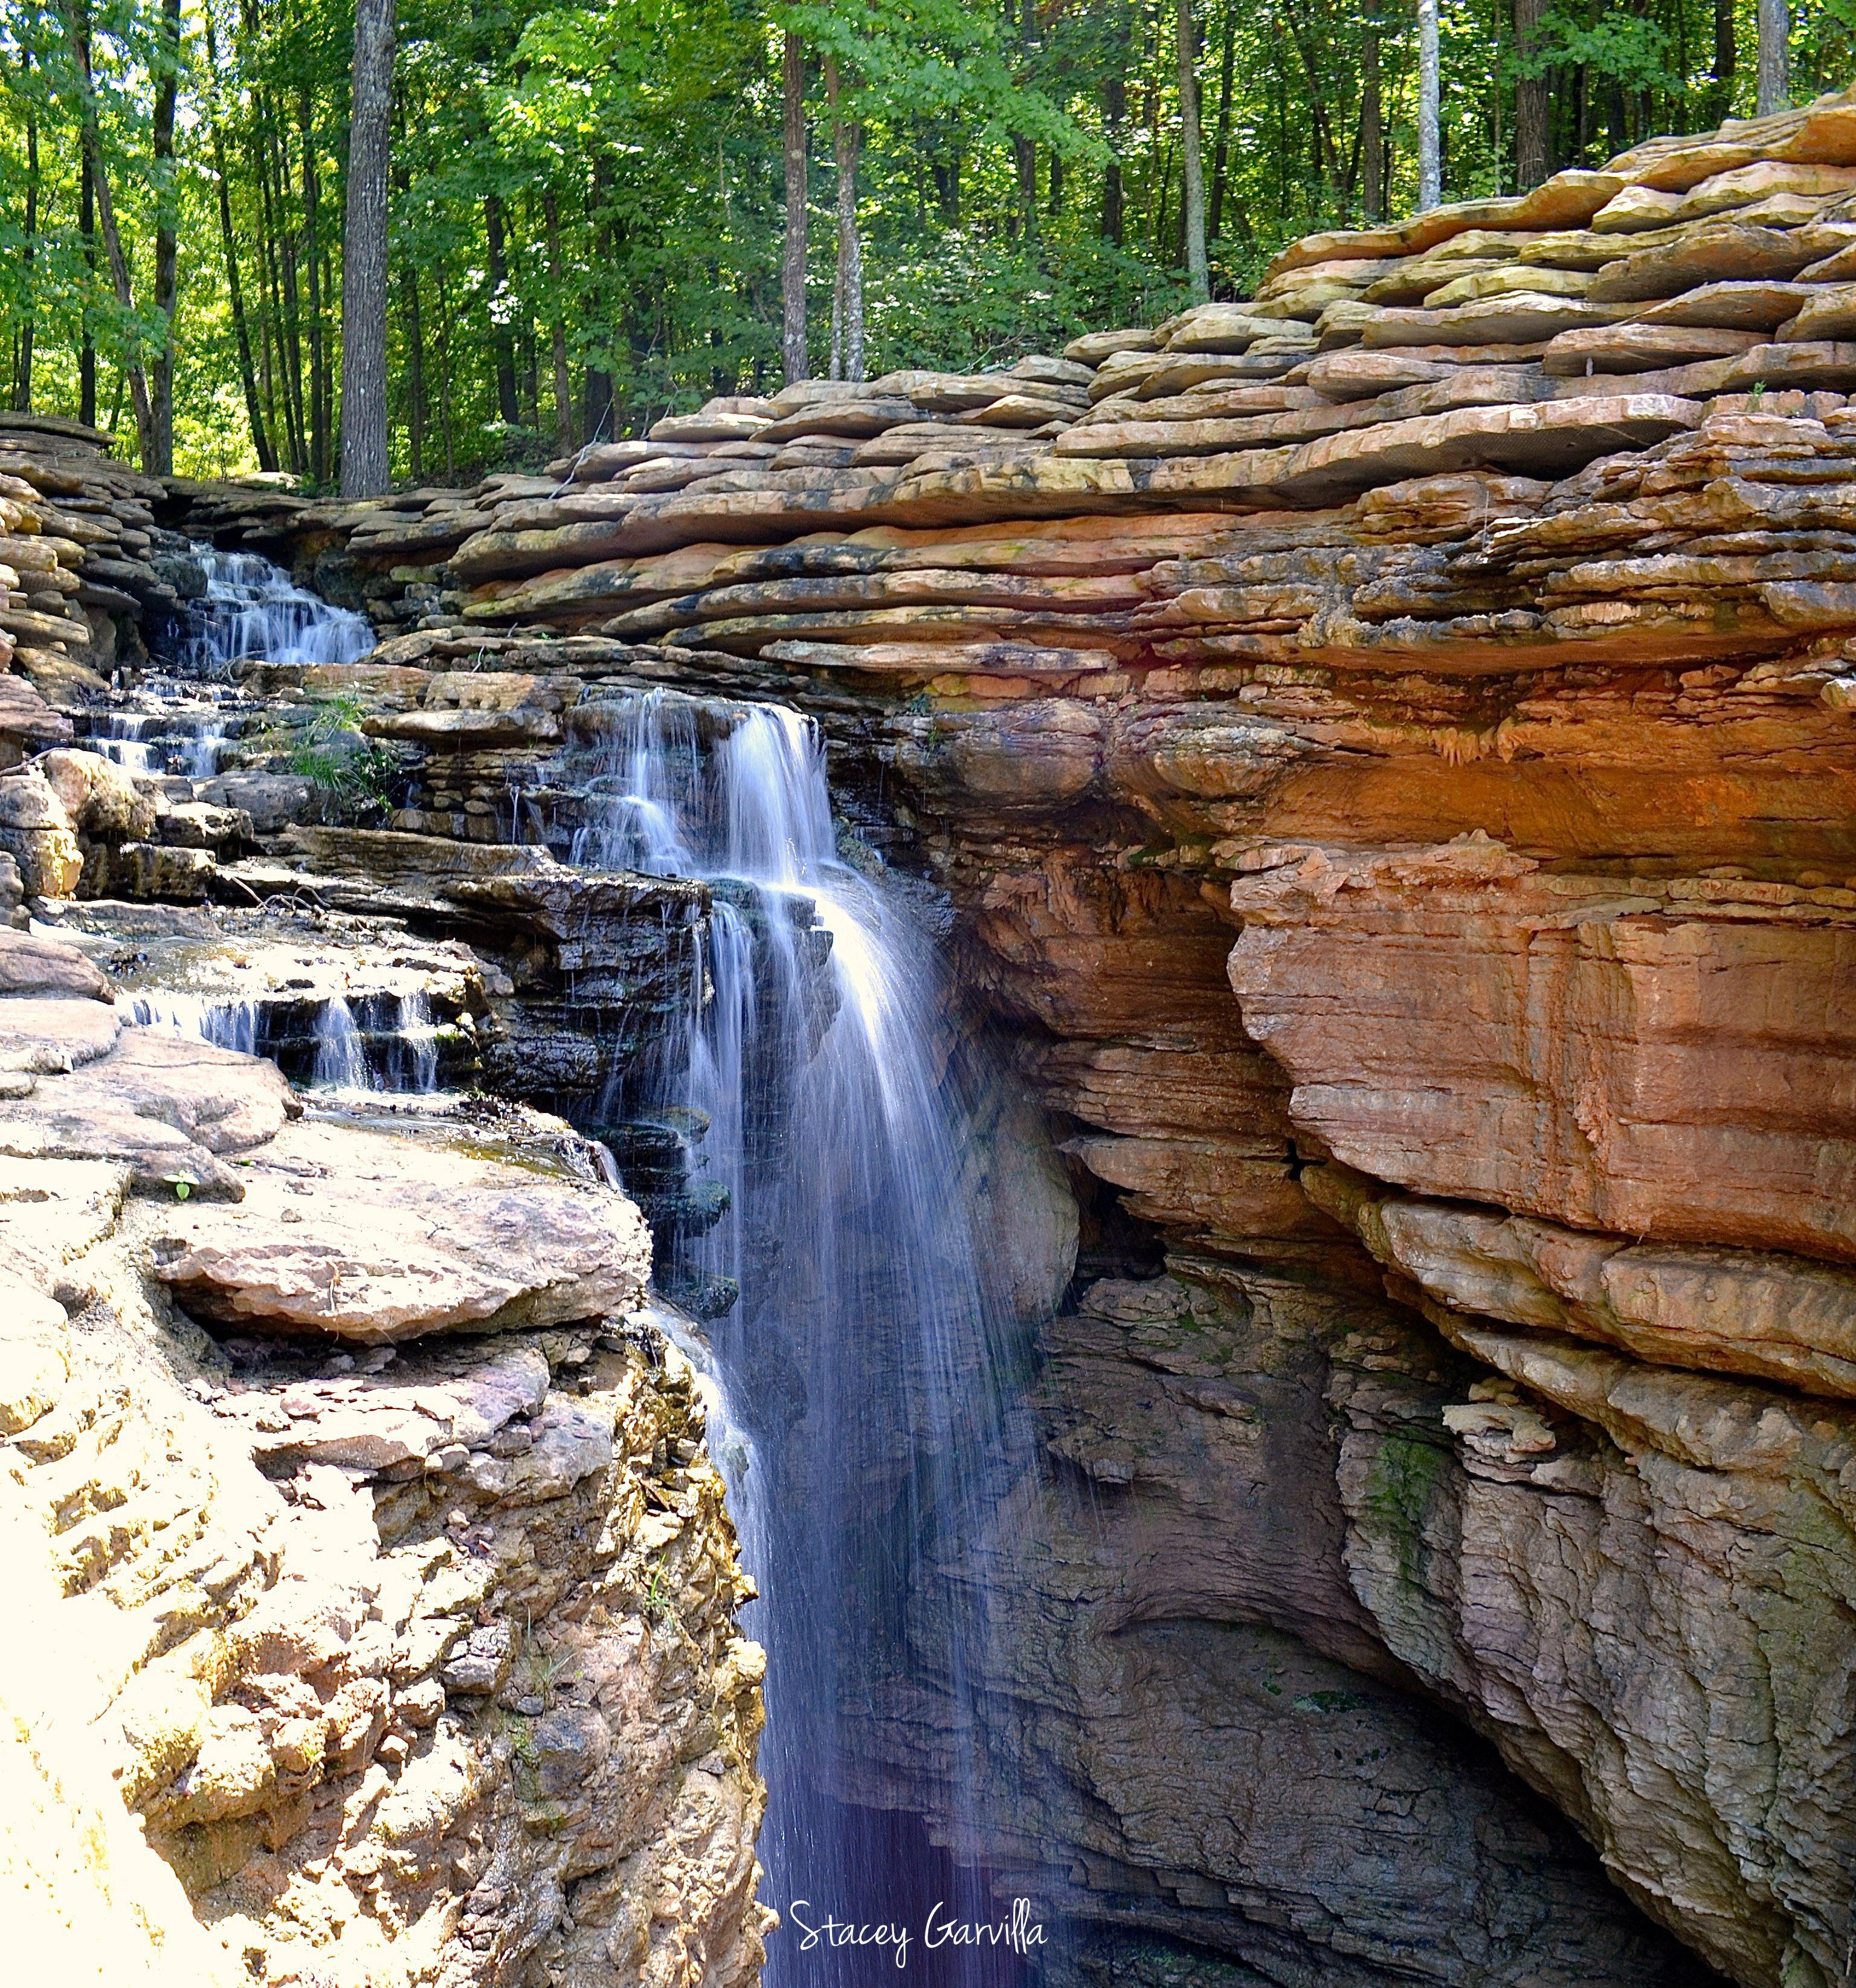 Waterfall Located At Top Of The Rock In Ridgedale Missouri Near Table Rock Lake In Branson Missouri Ozarks September 2016 Ozarks Waterfall Table Rock Lake